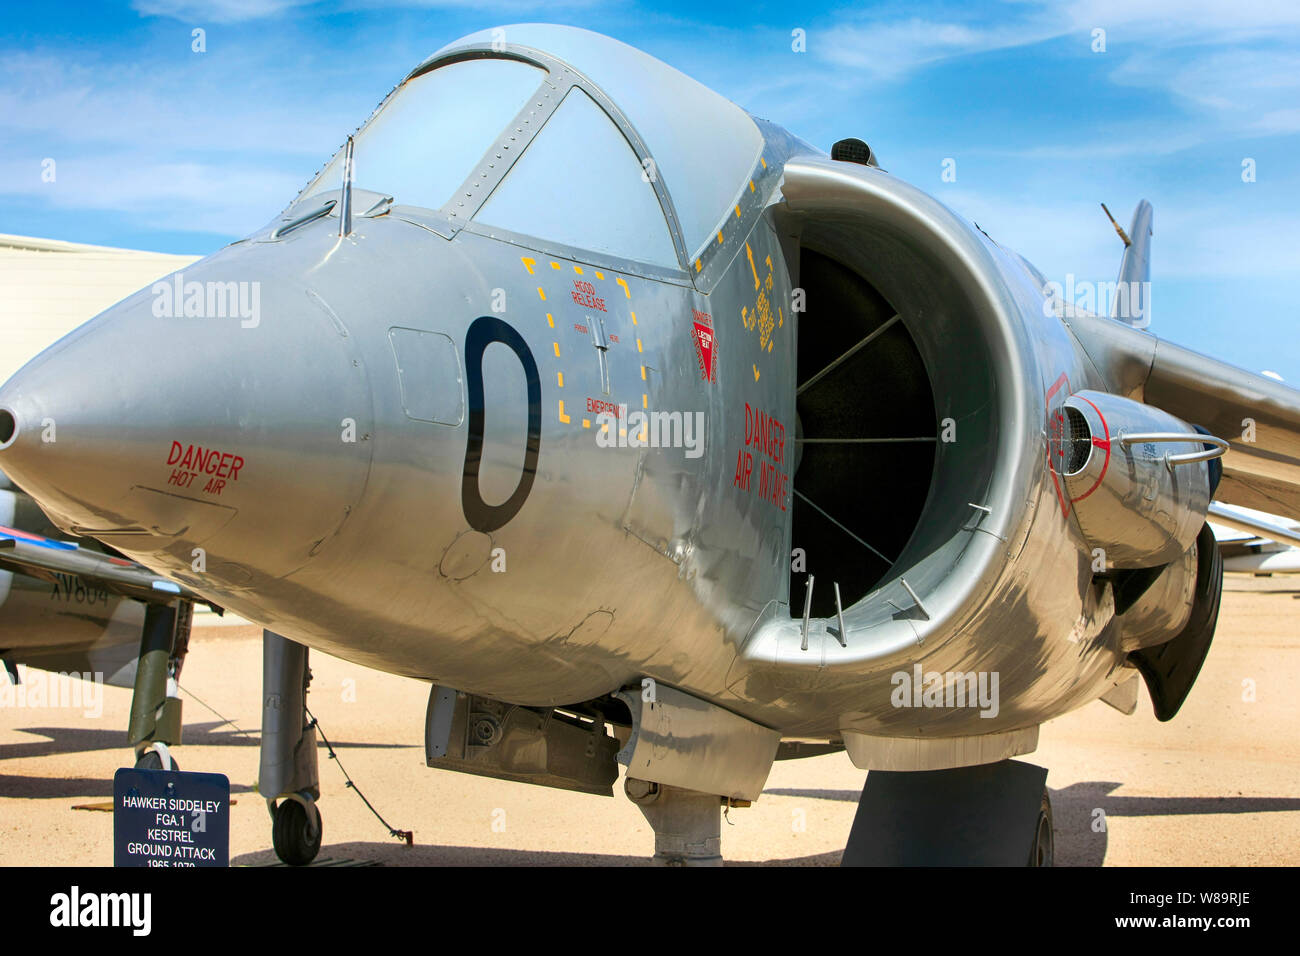 La Hawker Siddeley Kestrel FGA1 Avion de chasse à réaction Banque D'Images